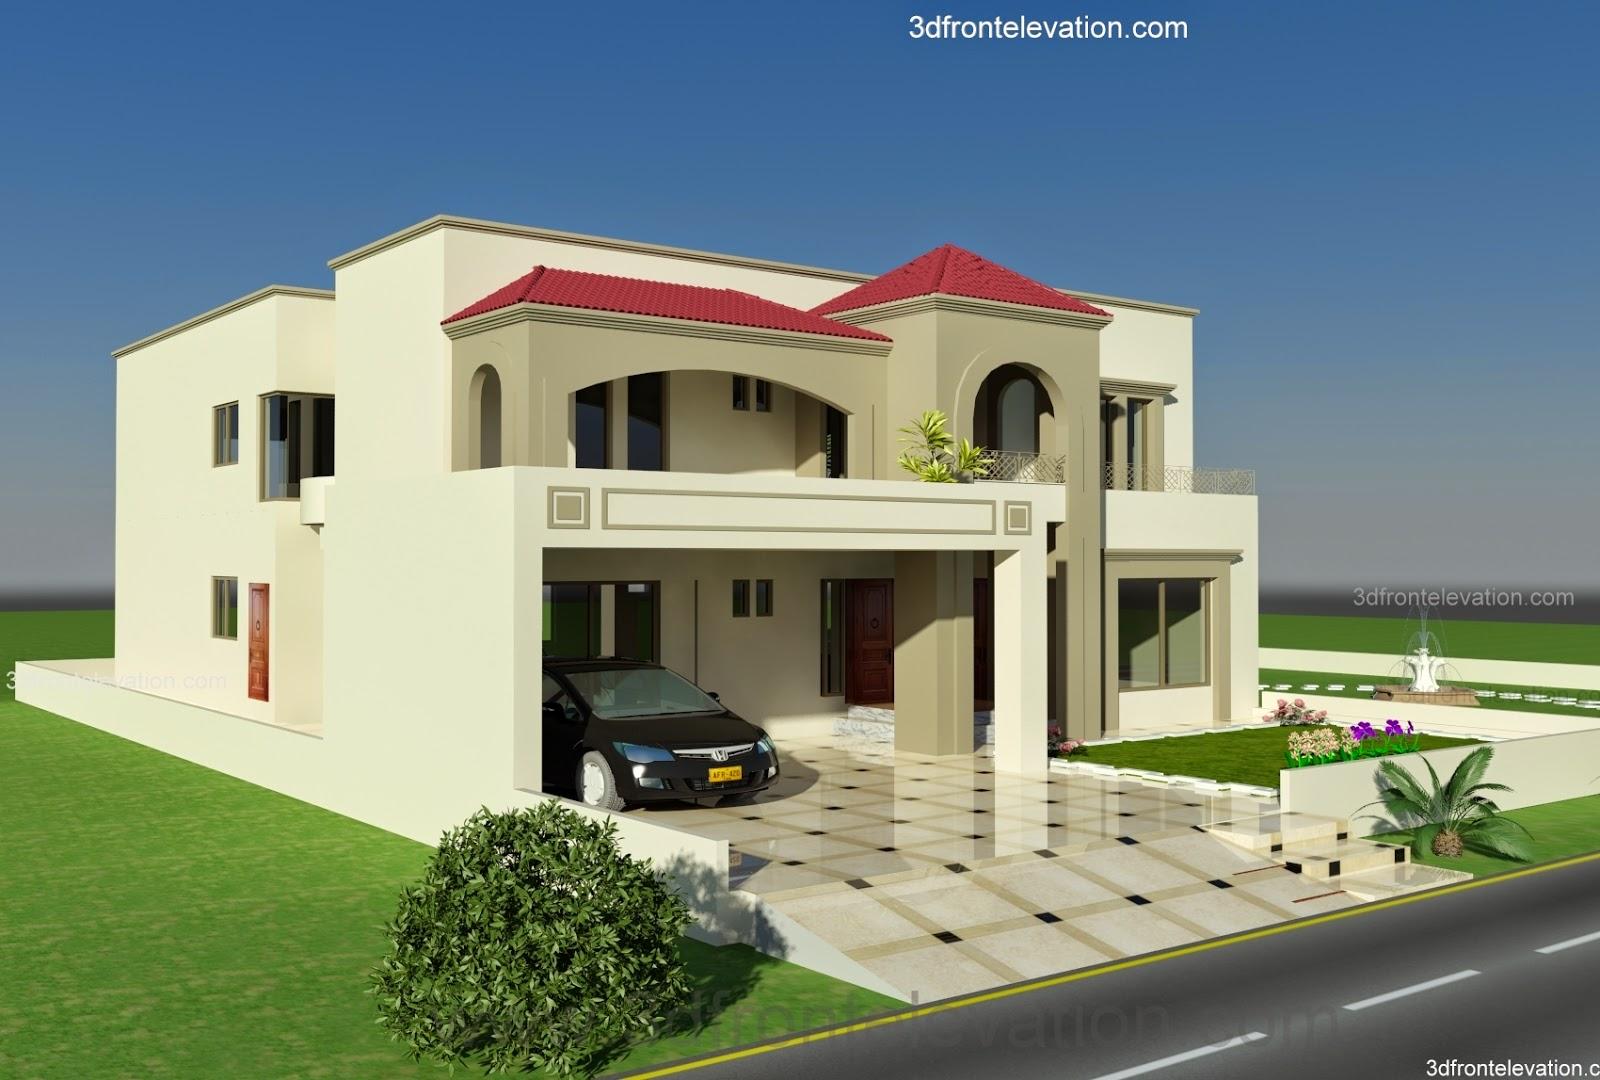 Architecture Design In Pakistan modern architecture house plan corner plot design in lahore pakistan